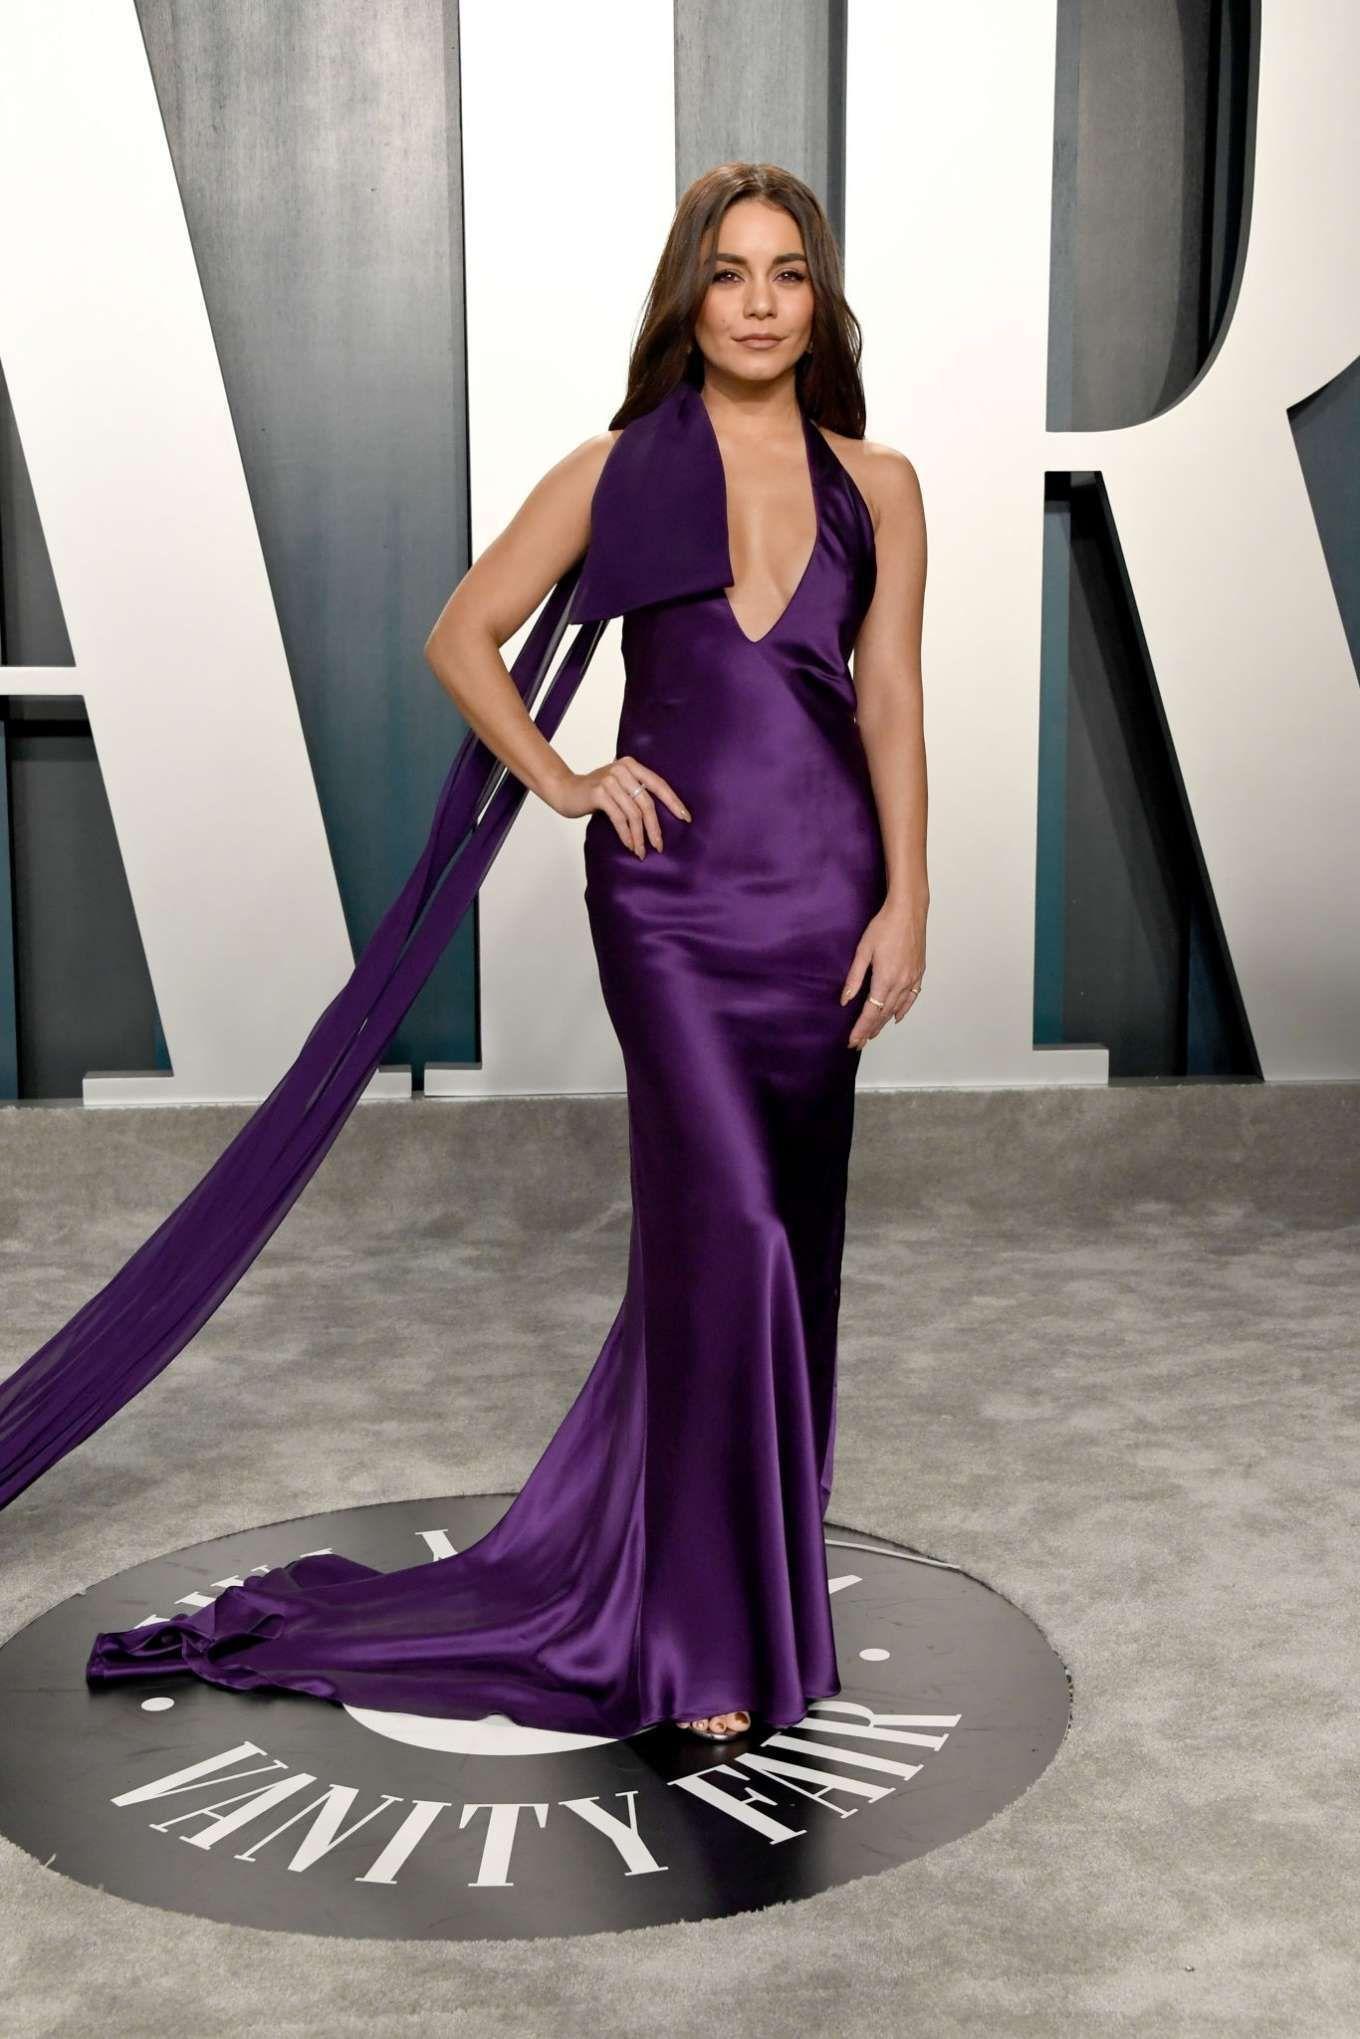 Vanessa Hudgens Purple Satin Maxi Dress 2020 Vanity Fair Oscar Party 2020 On Sassy Daily Dresses Purple Satin Dress Nice Dresses [ 2039 x 1360 Pixel ]